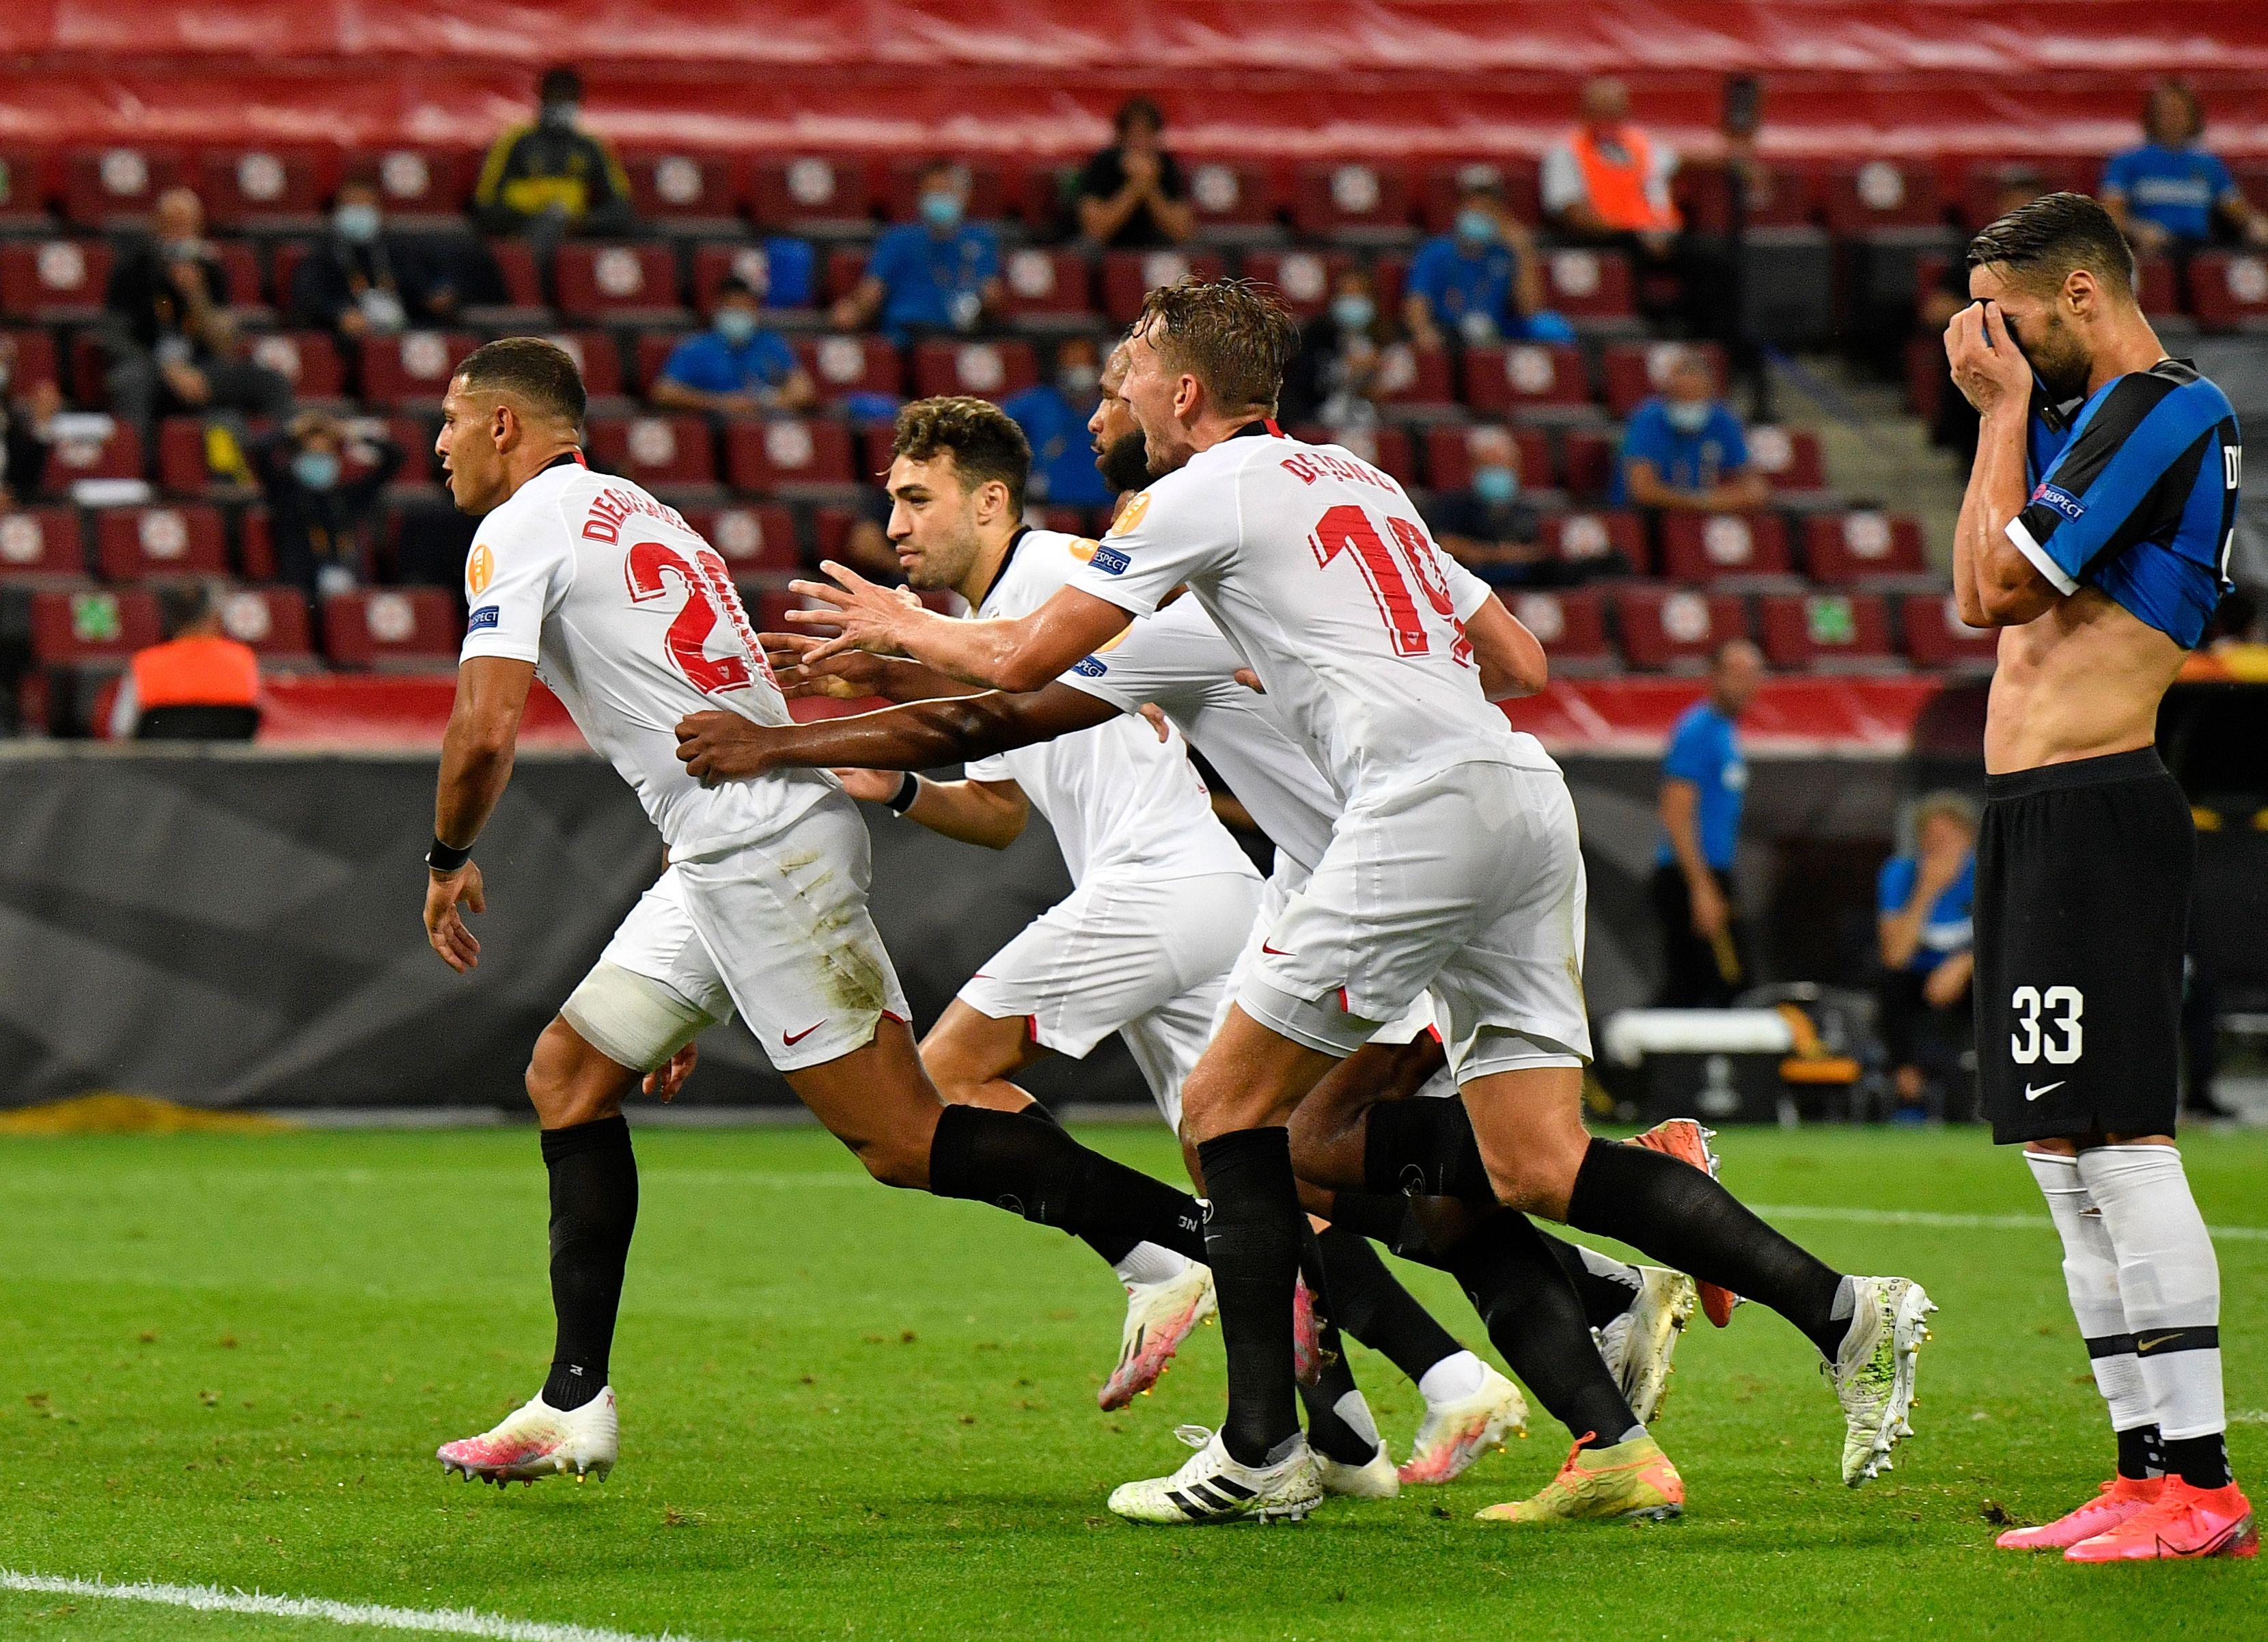 Sevilla, hexacampeón de la Europa League: venció 3-2 al Inter – CNN